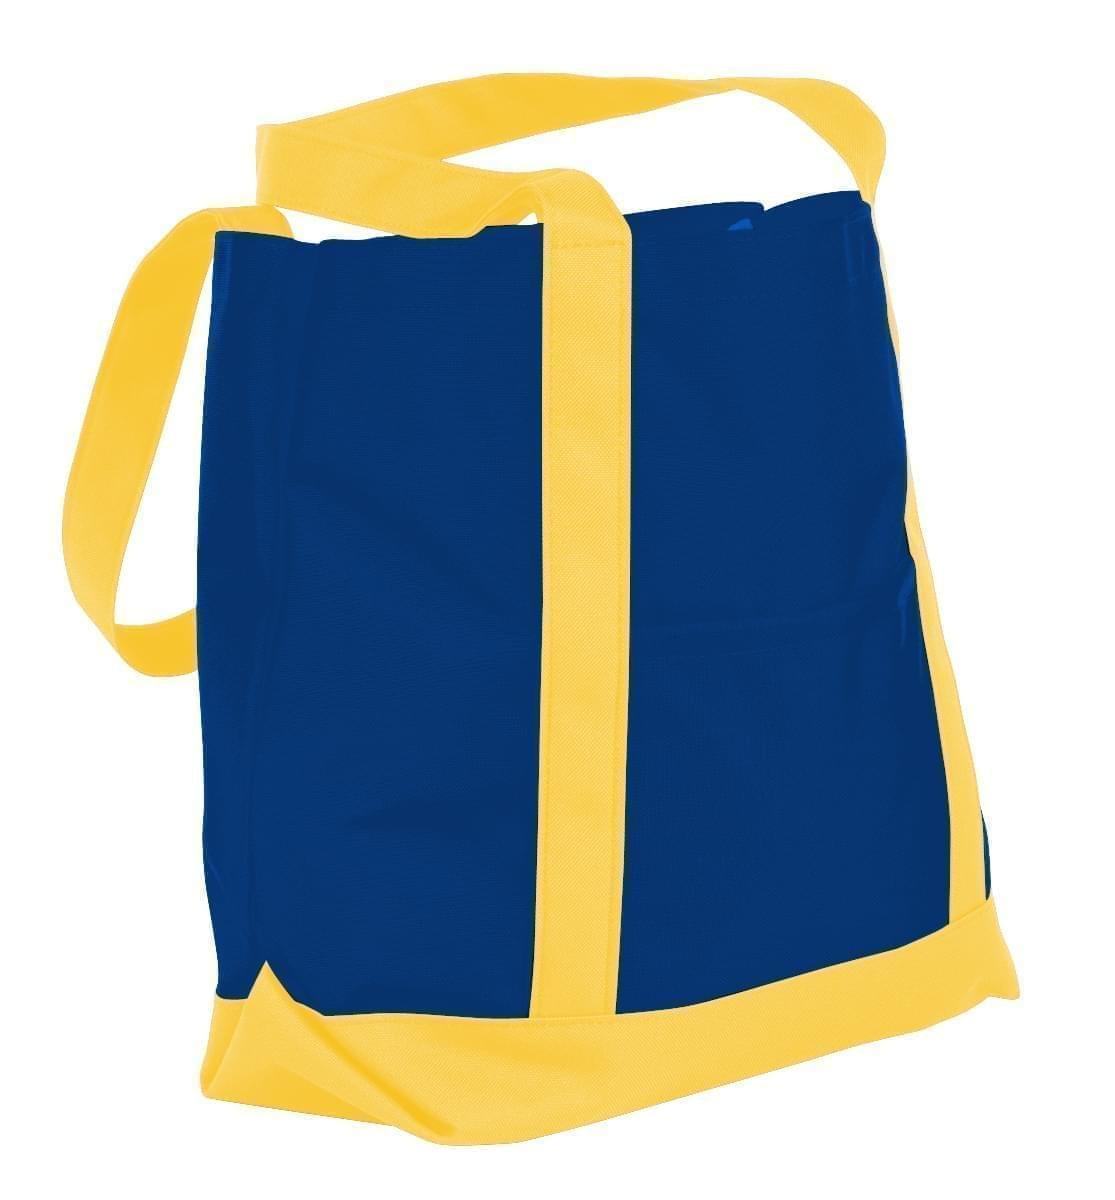 USA Made Nylon Poly Boat Tote Bags, Royal Blue-Gold, XAACL1UA0Q